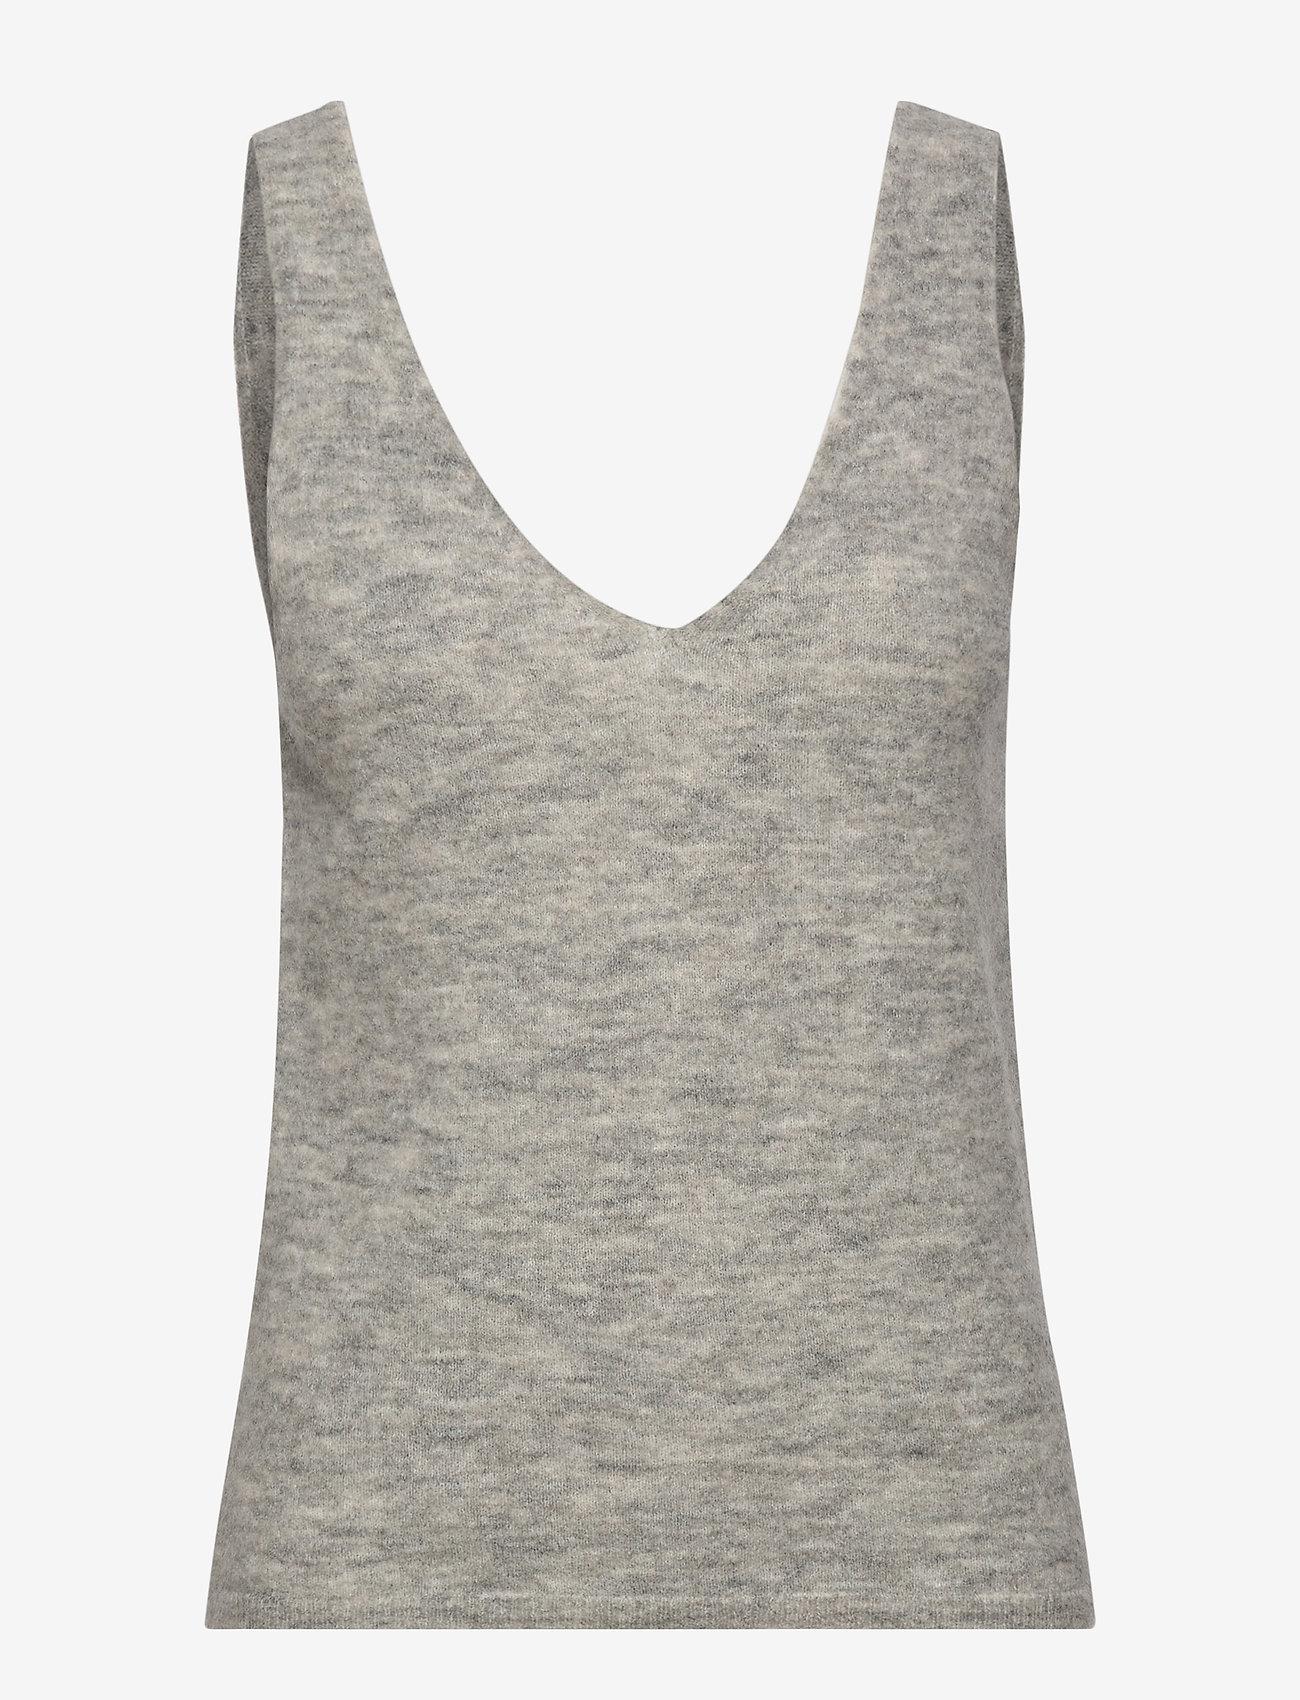 Stylein - ETOILE TOP - tops zonder mouwen - light grey - 1